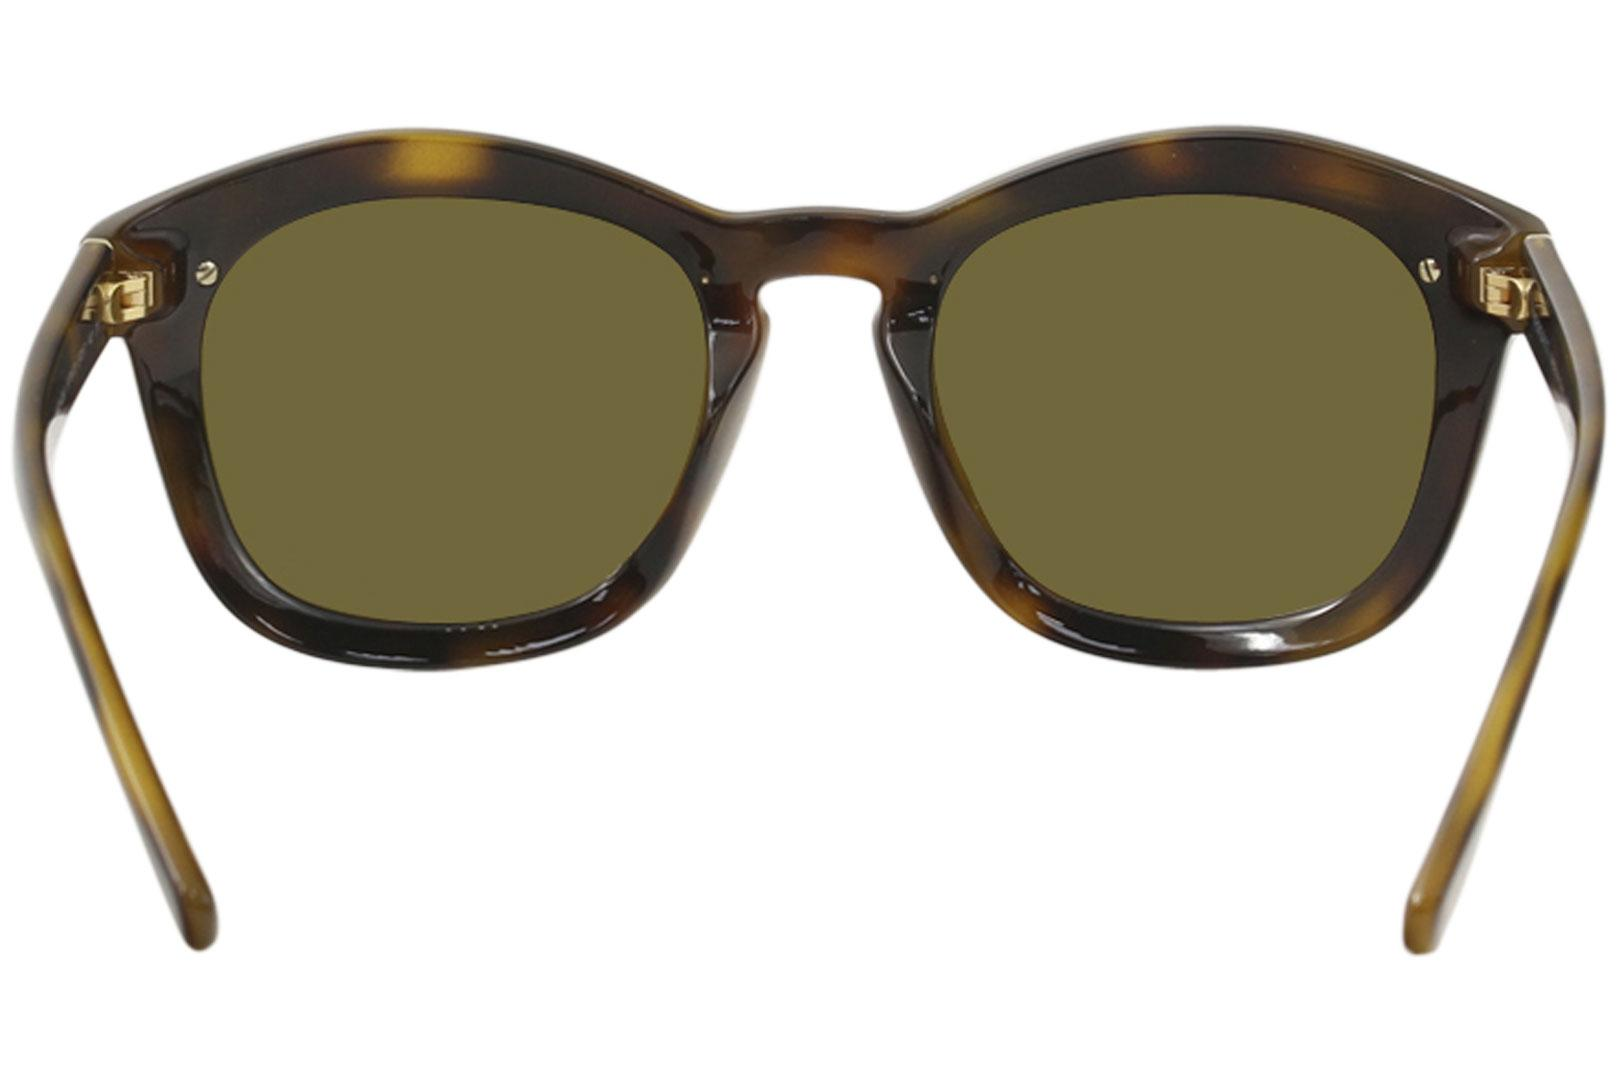 002dae78ea Versace Women s VE4350 VE 4350 Fashion Square Sunglasses